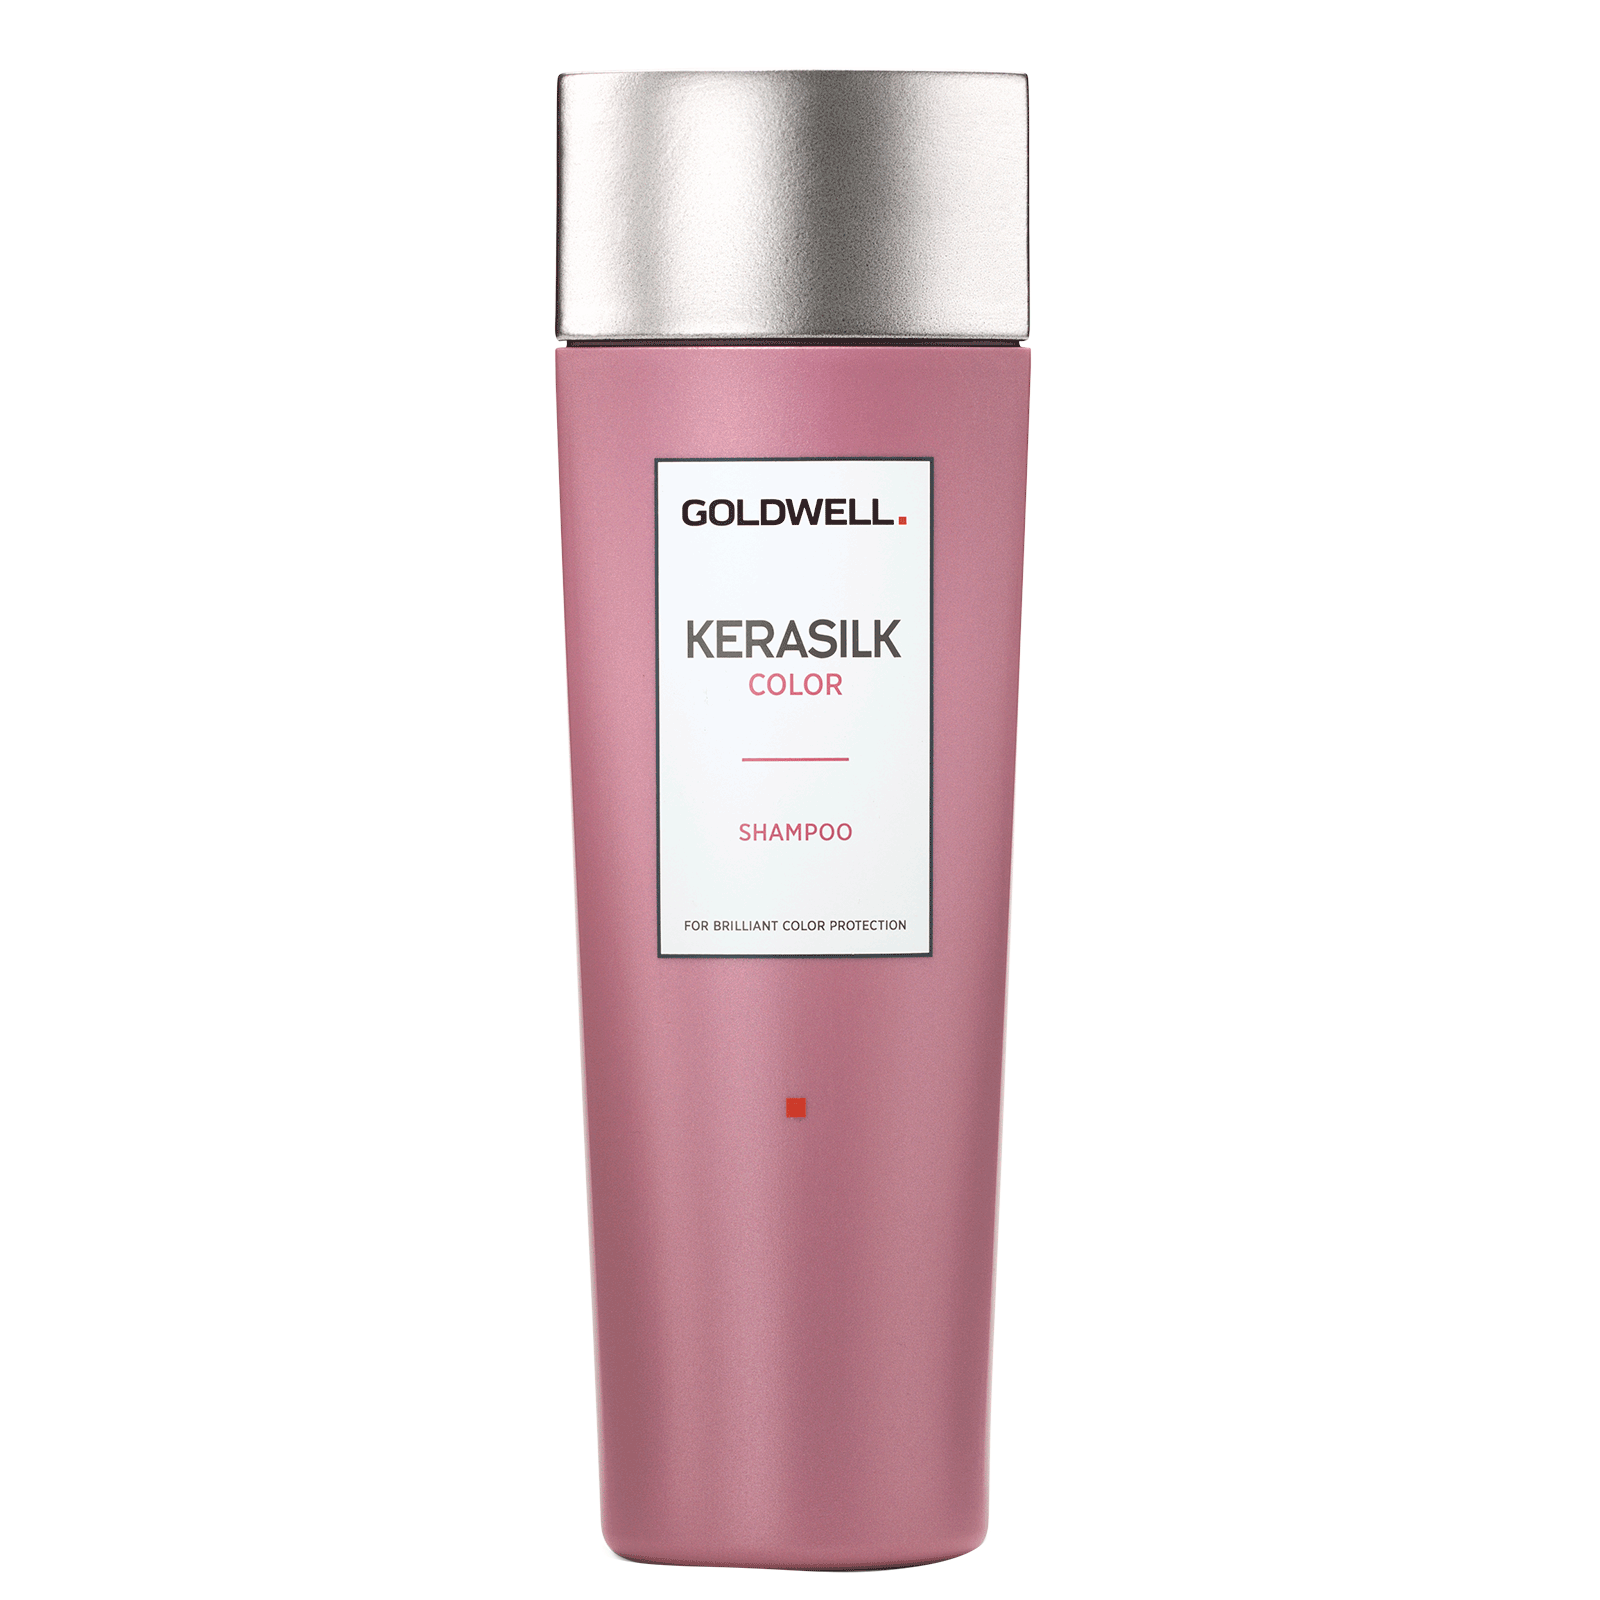 Goldwell USA Kerasilk Color Gentle Shampoo 8.4oz